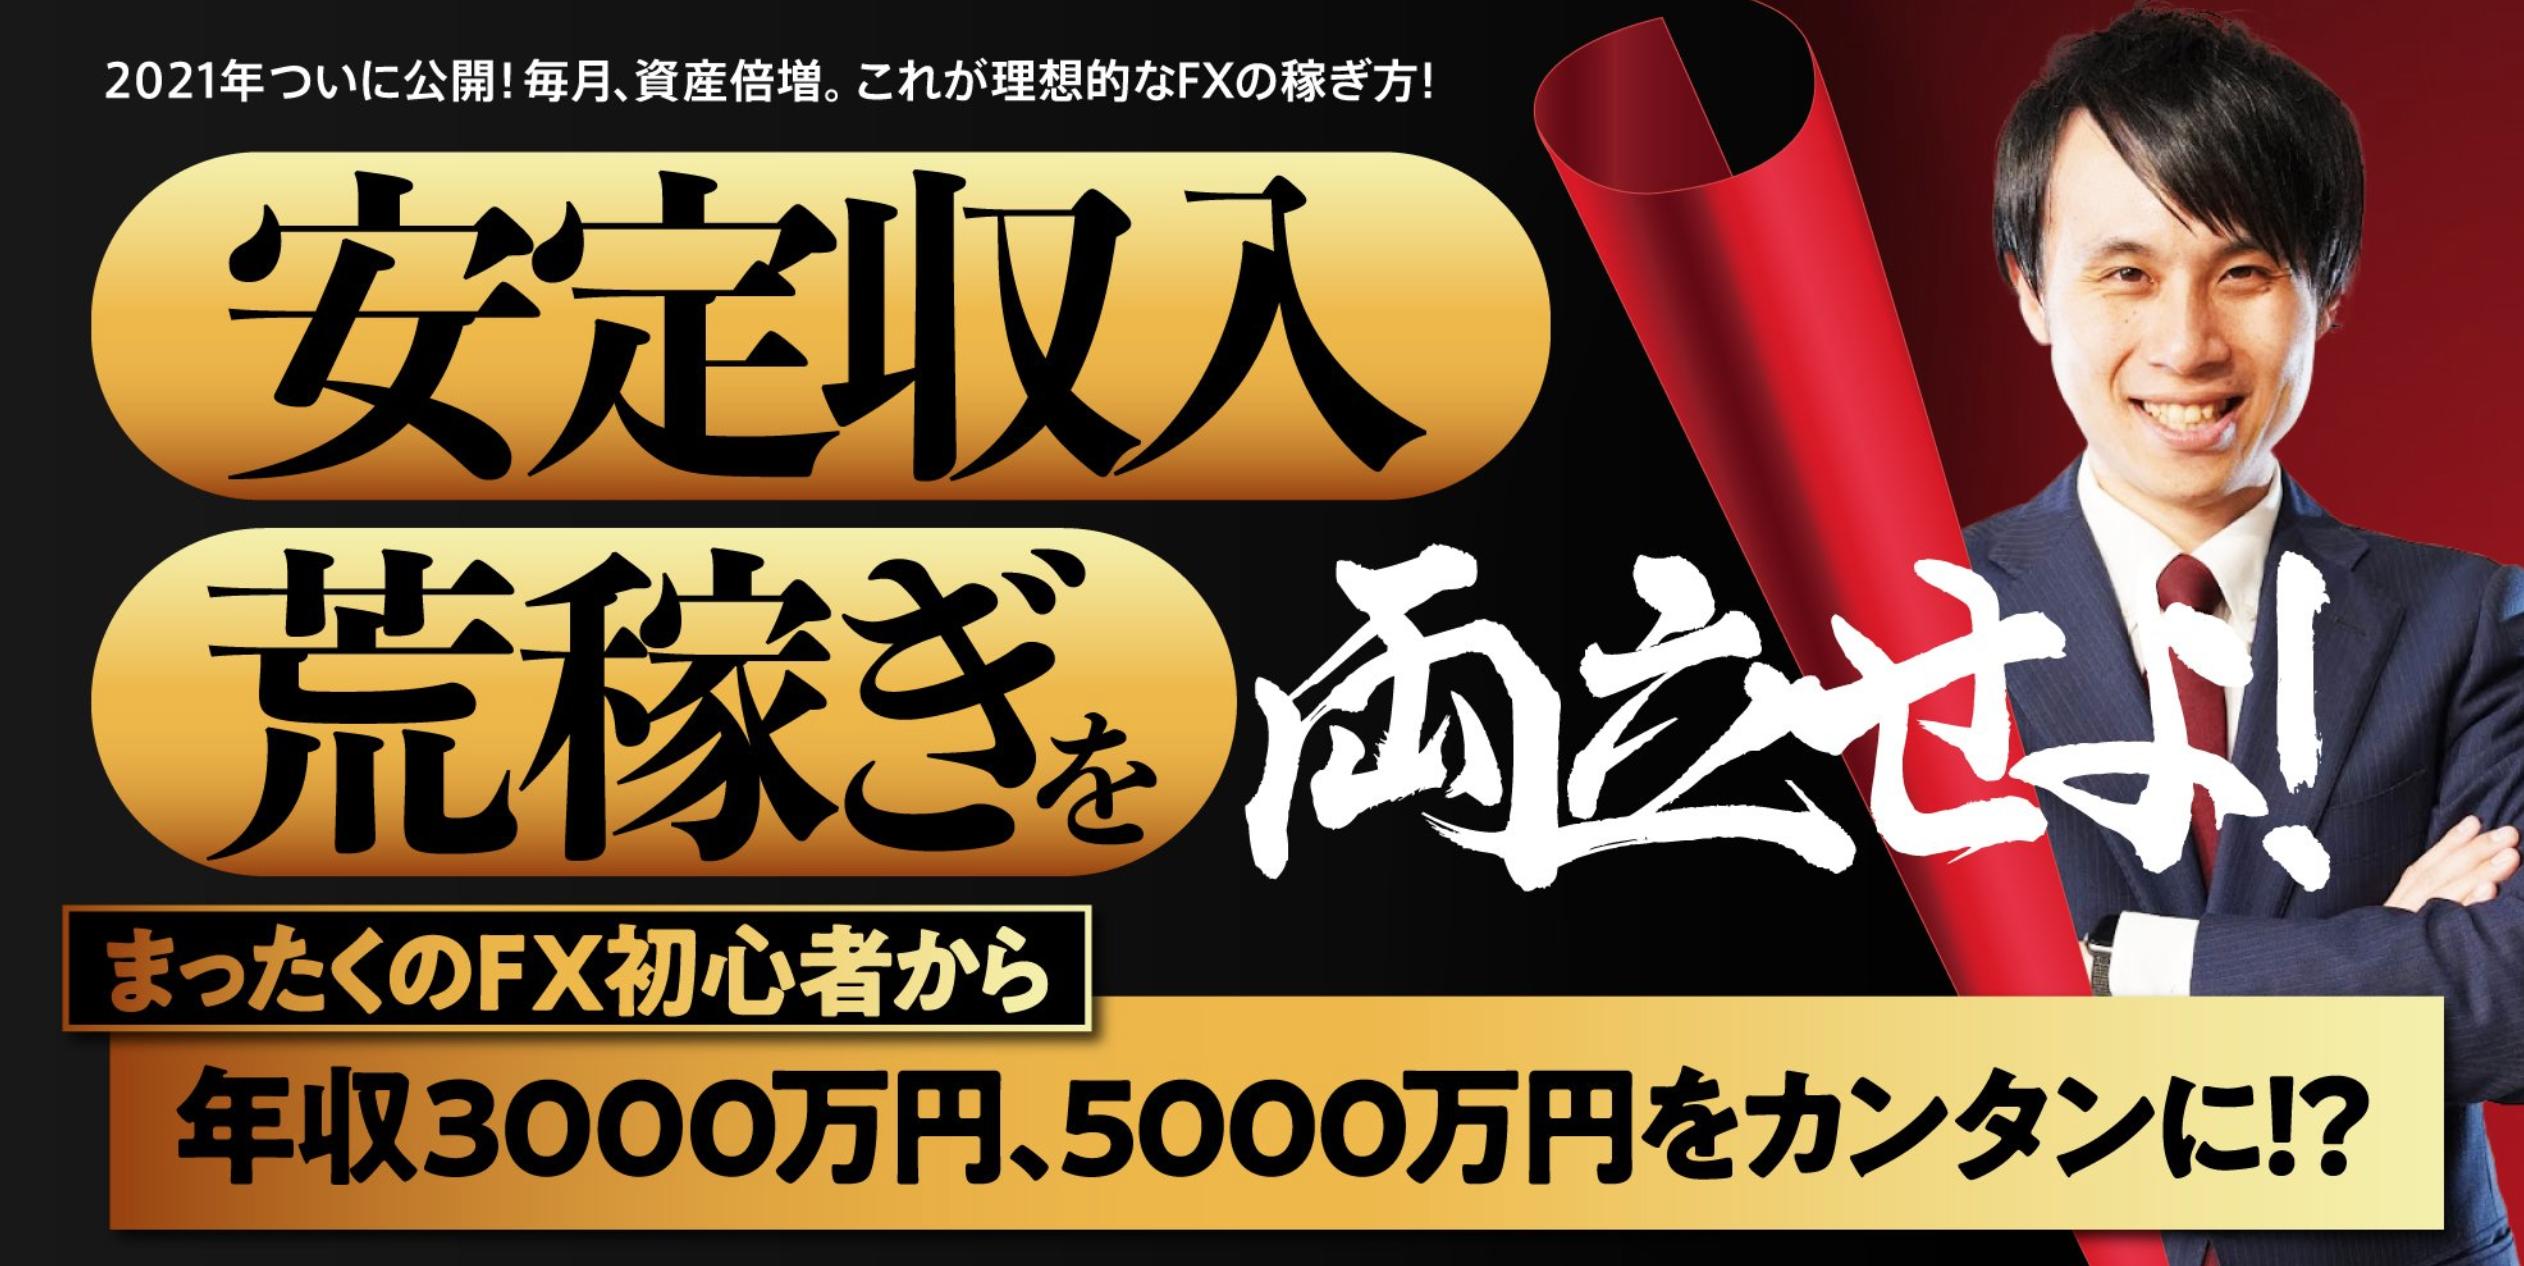 FXkatsu FXスキャルピング 成功のイデア3